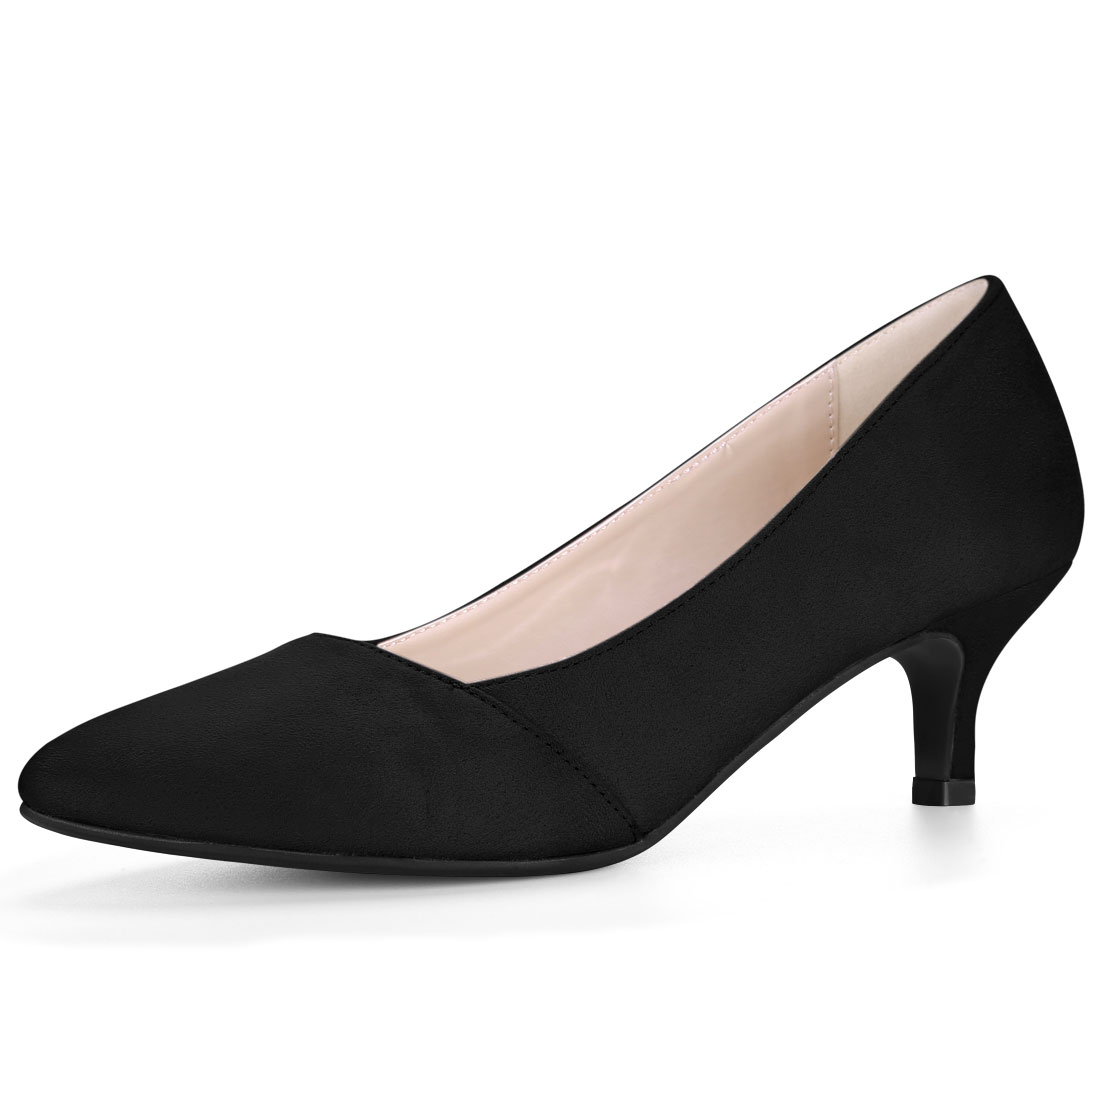 Women Pointed Toe Mid Stiletto Heel Pumps Black US 9.5